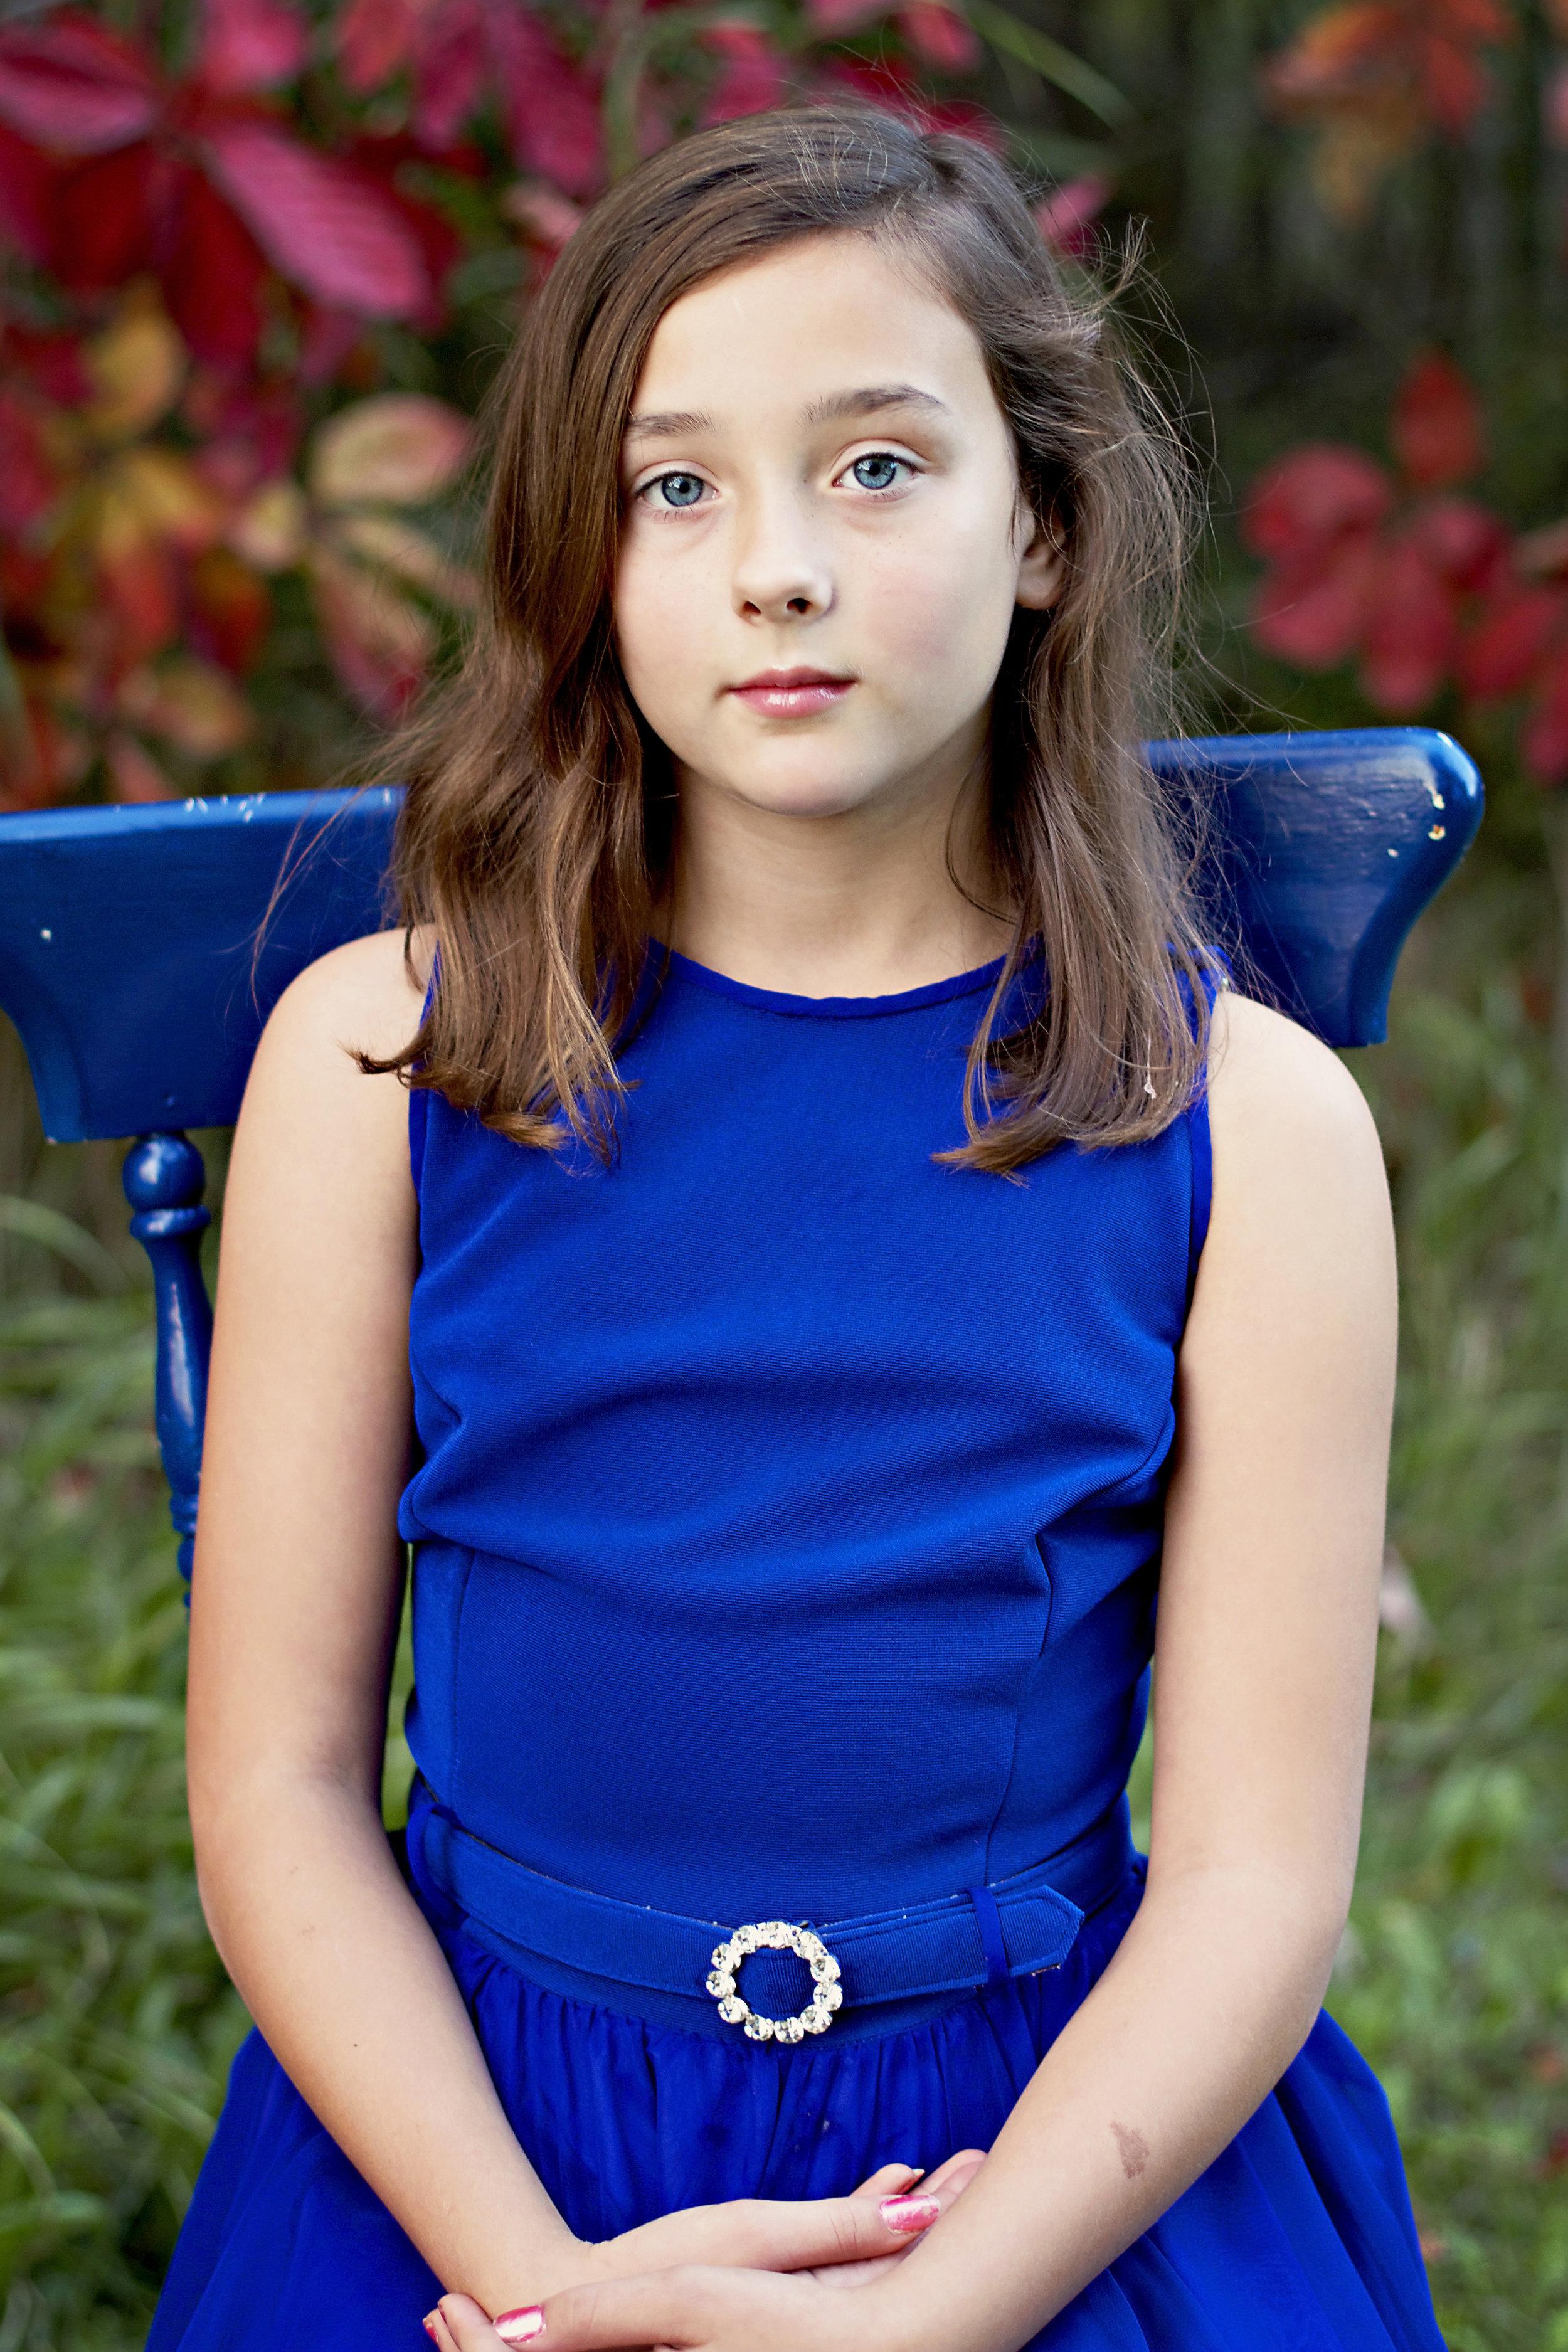 sabra blue chair sharpened for print.jpg